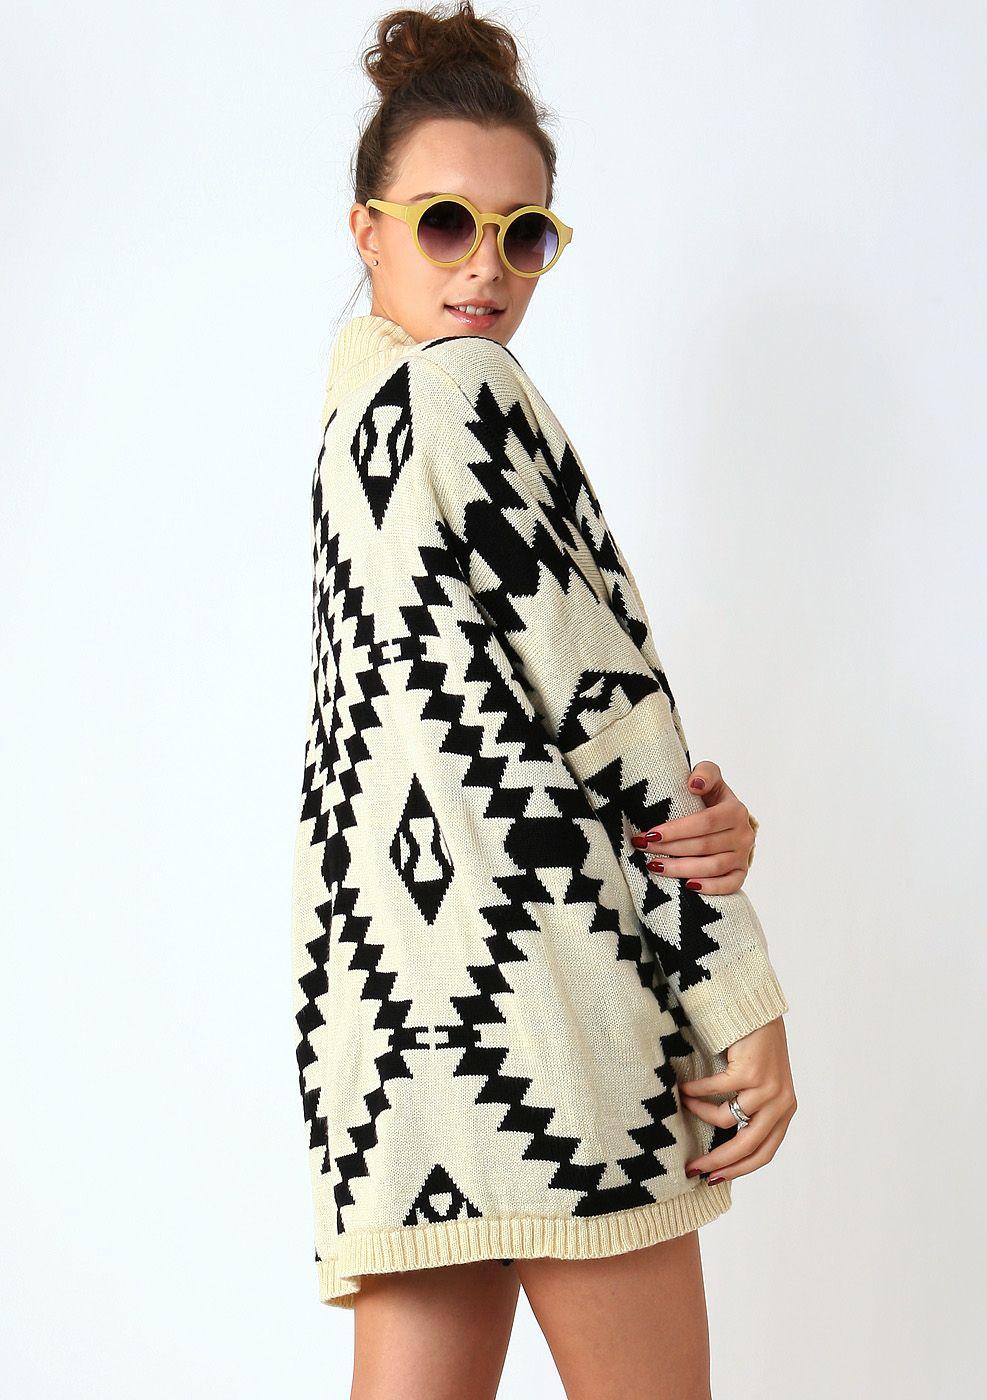 Aztec Open Knit Cardigan - New Arrivals - Retro, Indie and Unique Fashion